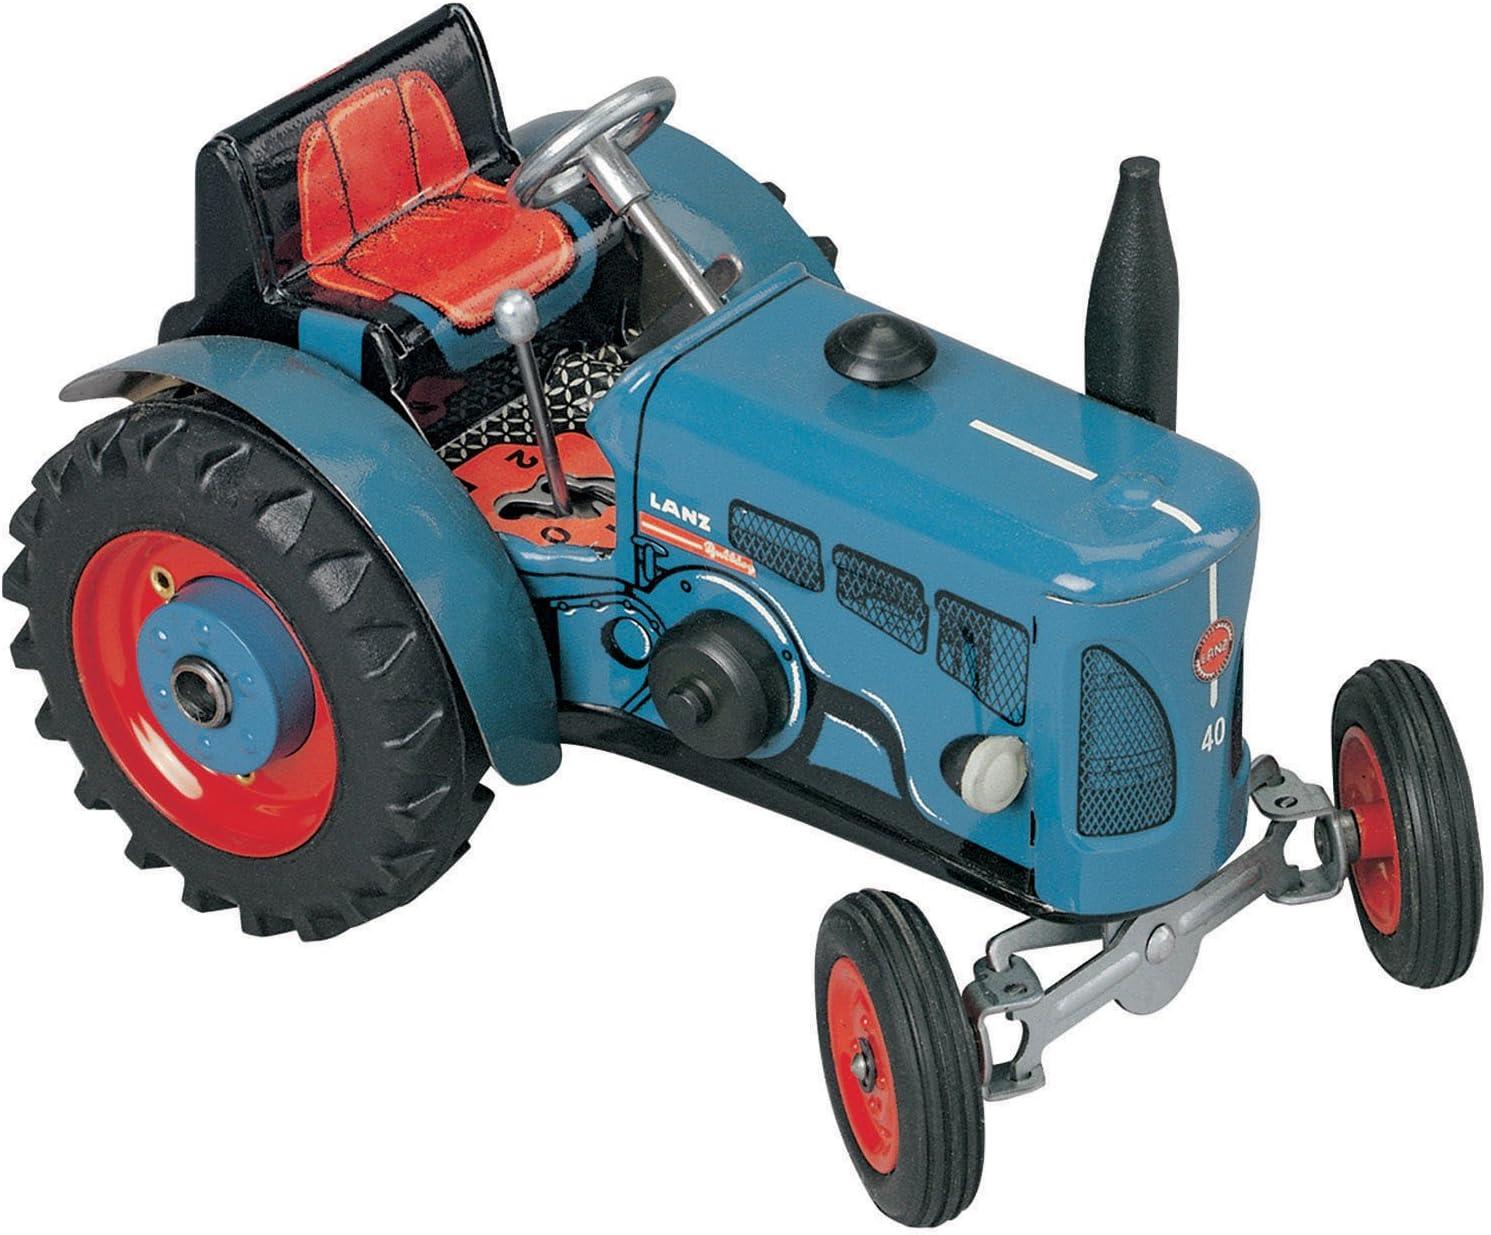 Lanz Bulldog 4016 Blechspielzeug Kovap Federmotor [Spielzeug